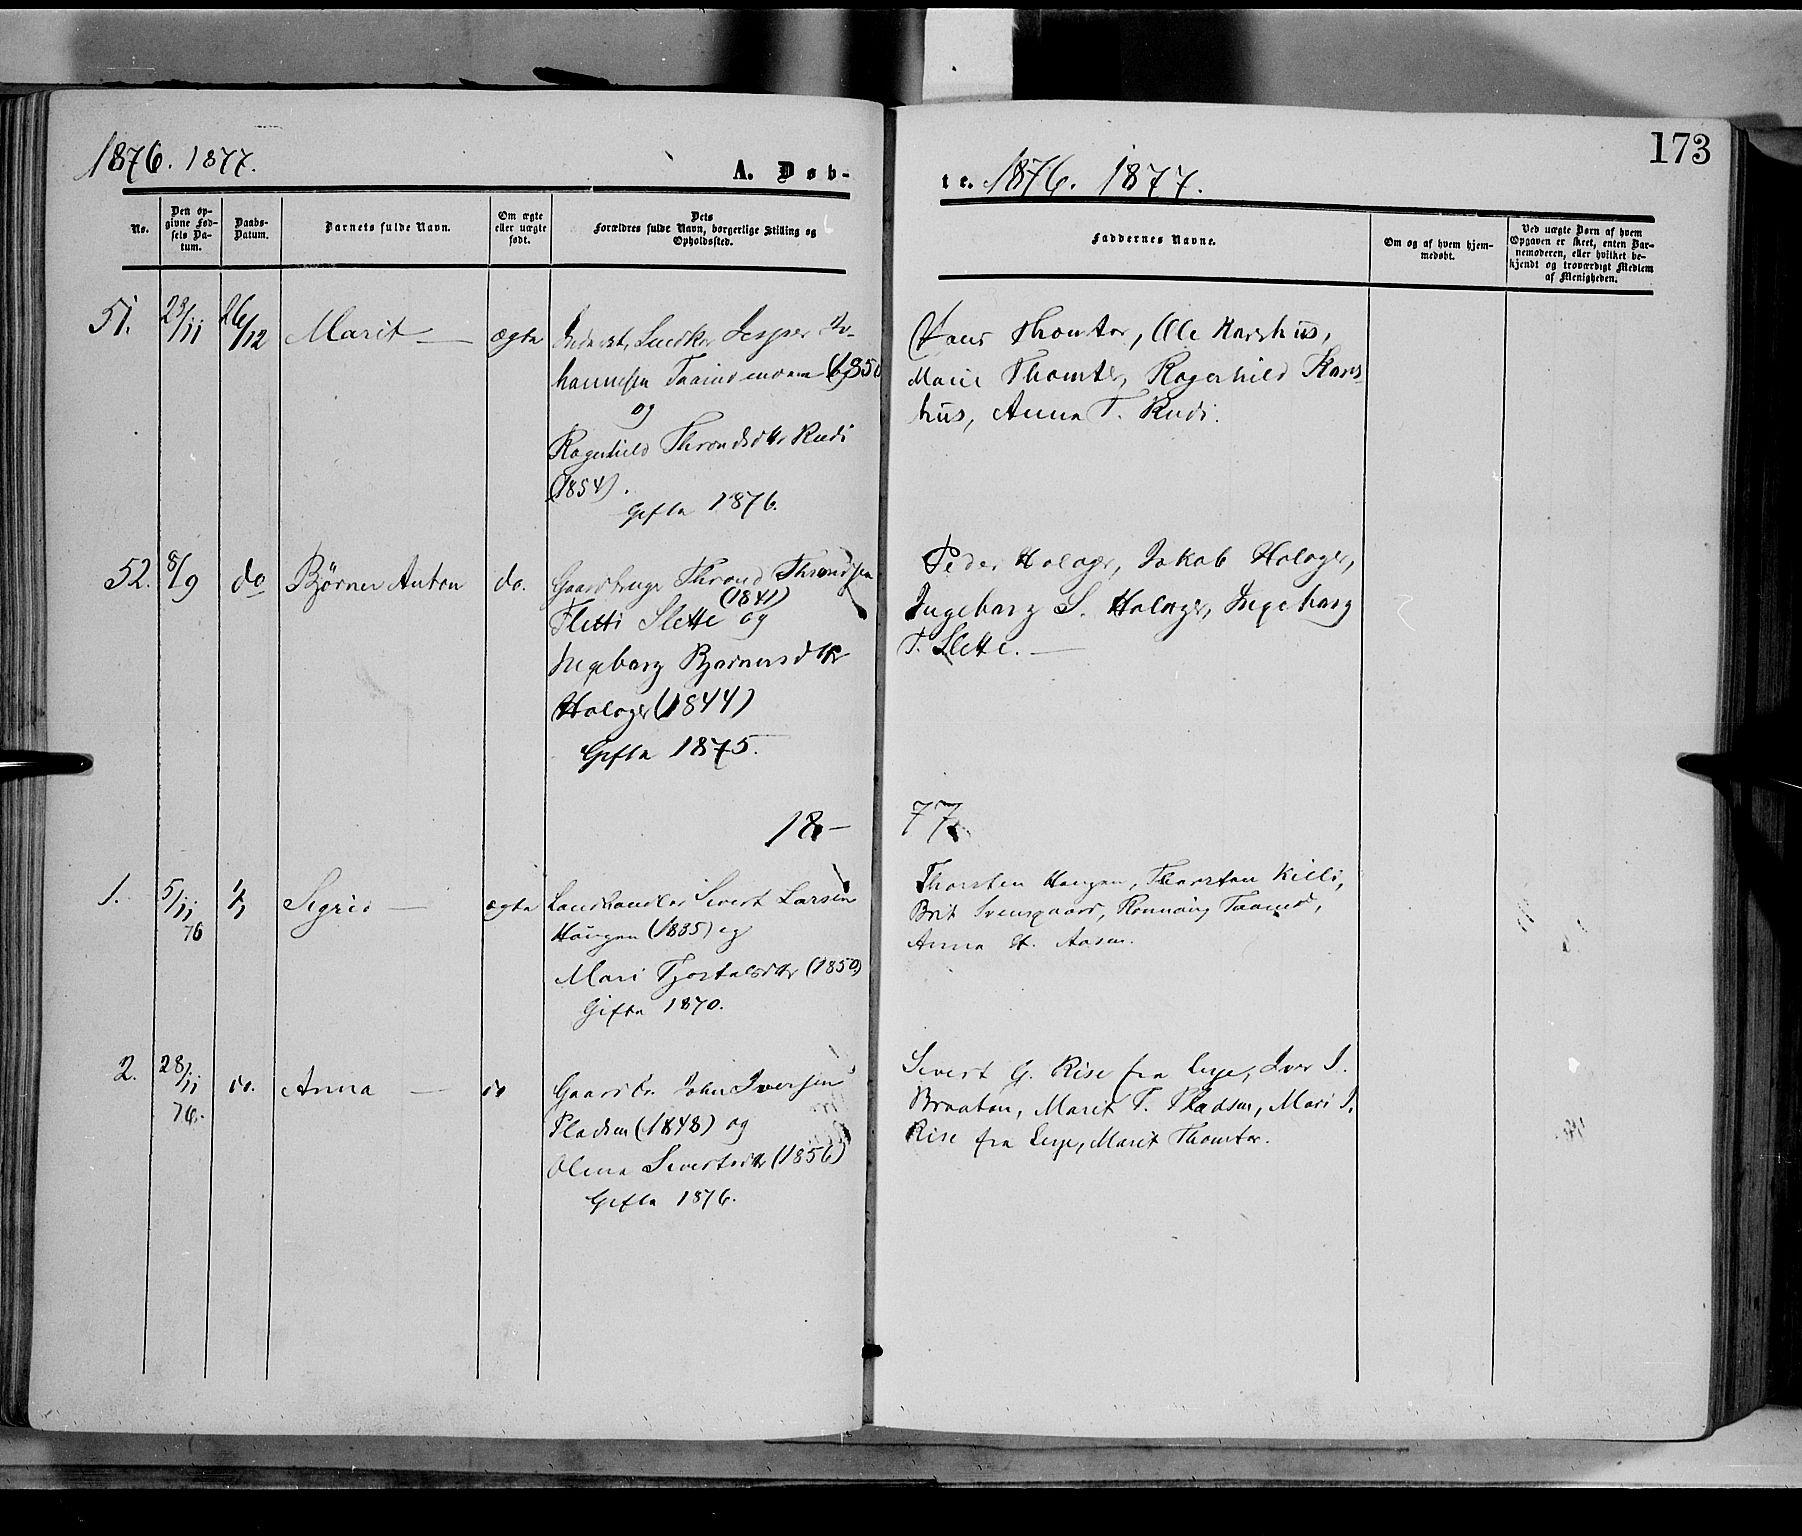 SAH, Dovre prestekontor, Parish register (official) no. 1, 1854-1878, p. 173